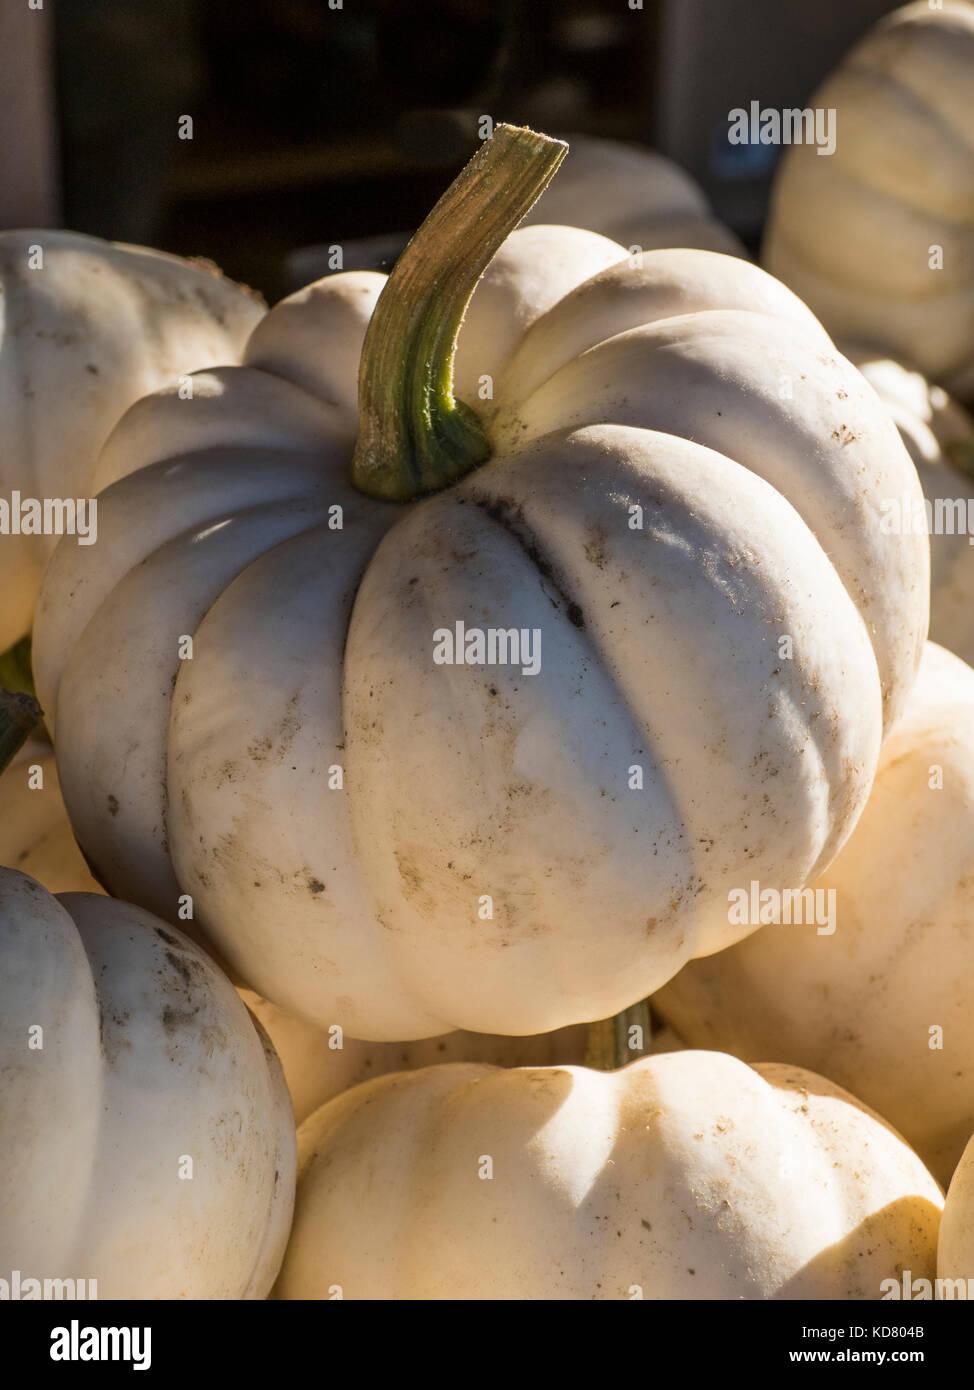 Valenciano pumpkins, Woodstock Farmers' Market, West Woodstock, Vermont. - Stock Image